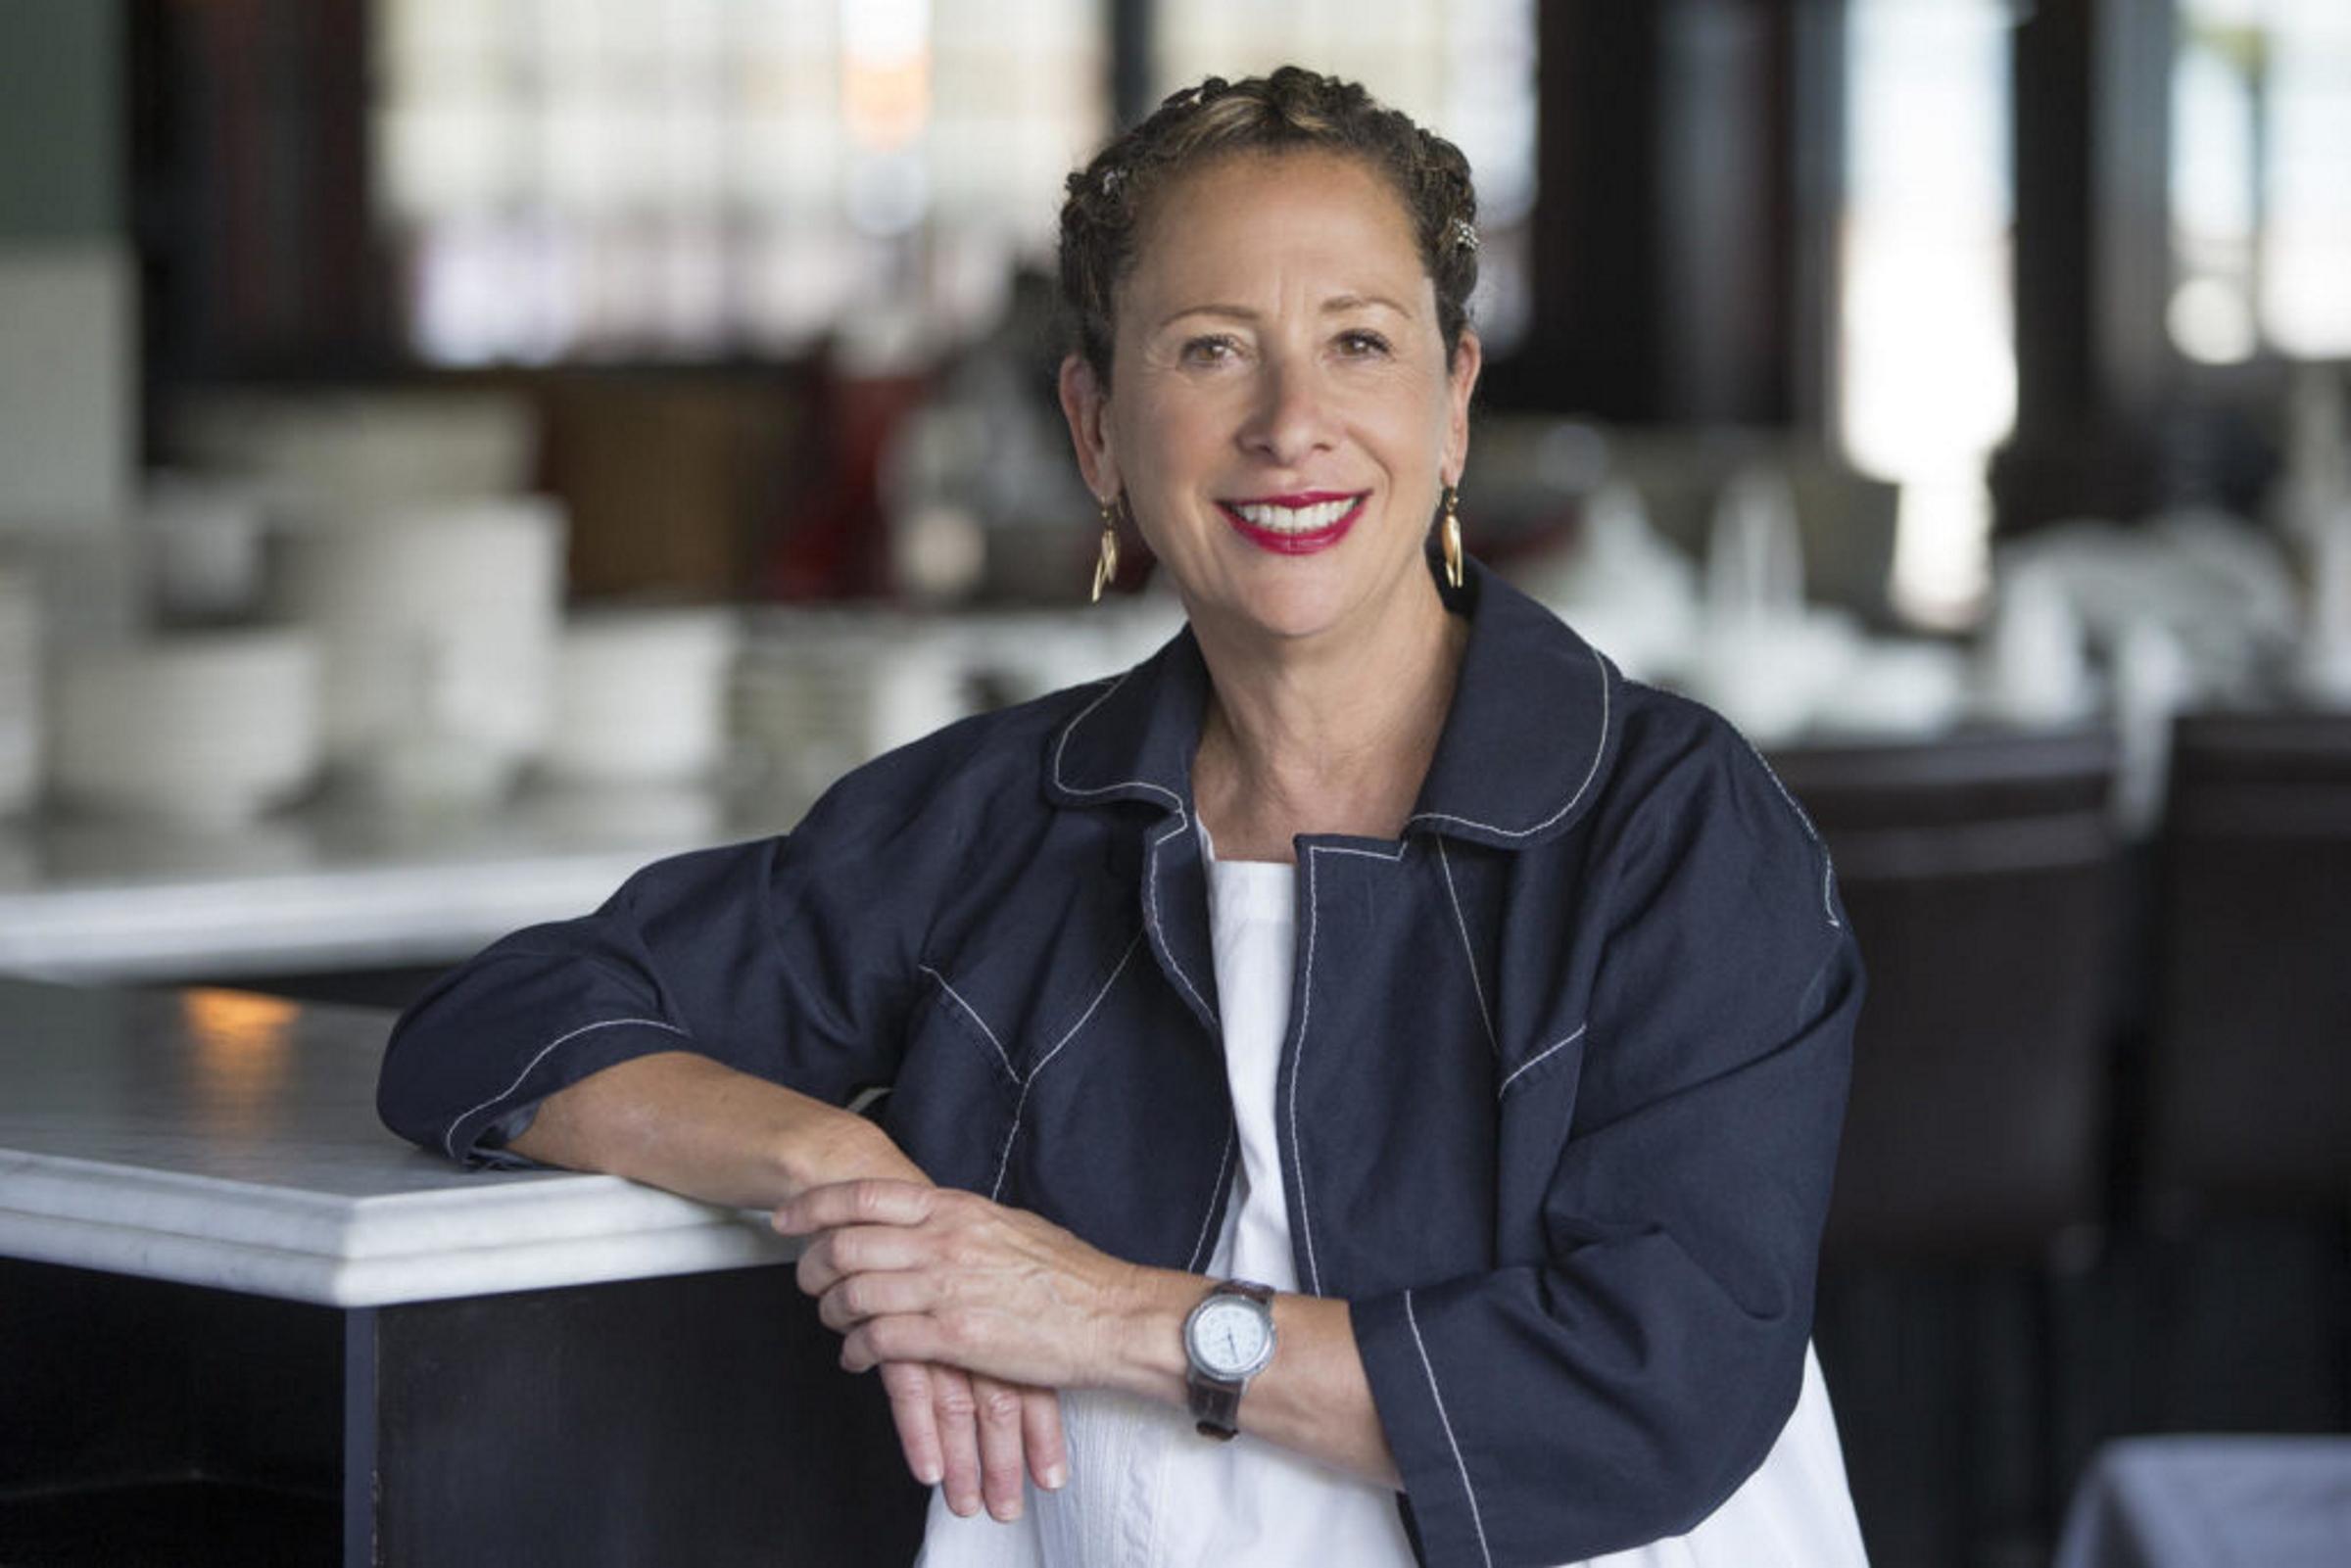 Osteria Mozza By Celebrated Chef Nancy Silverton To Open In Singapore